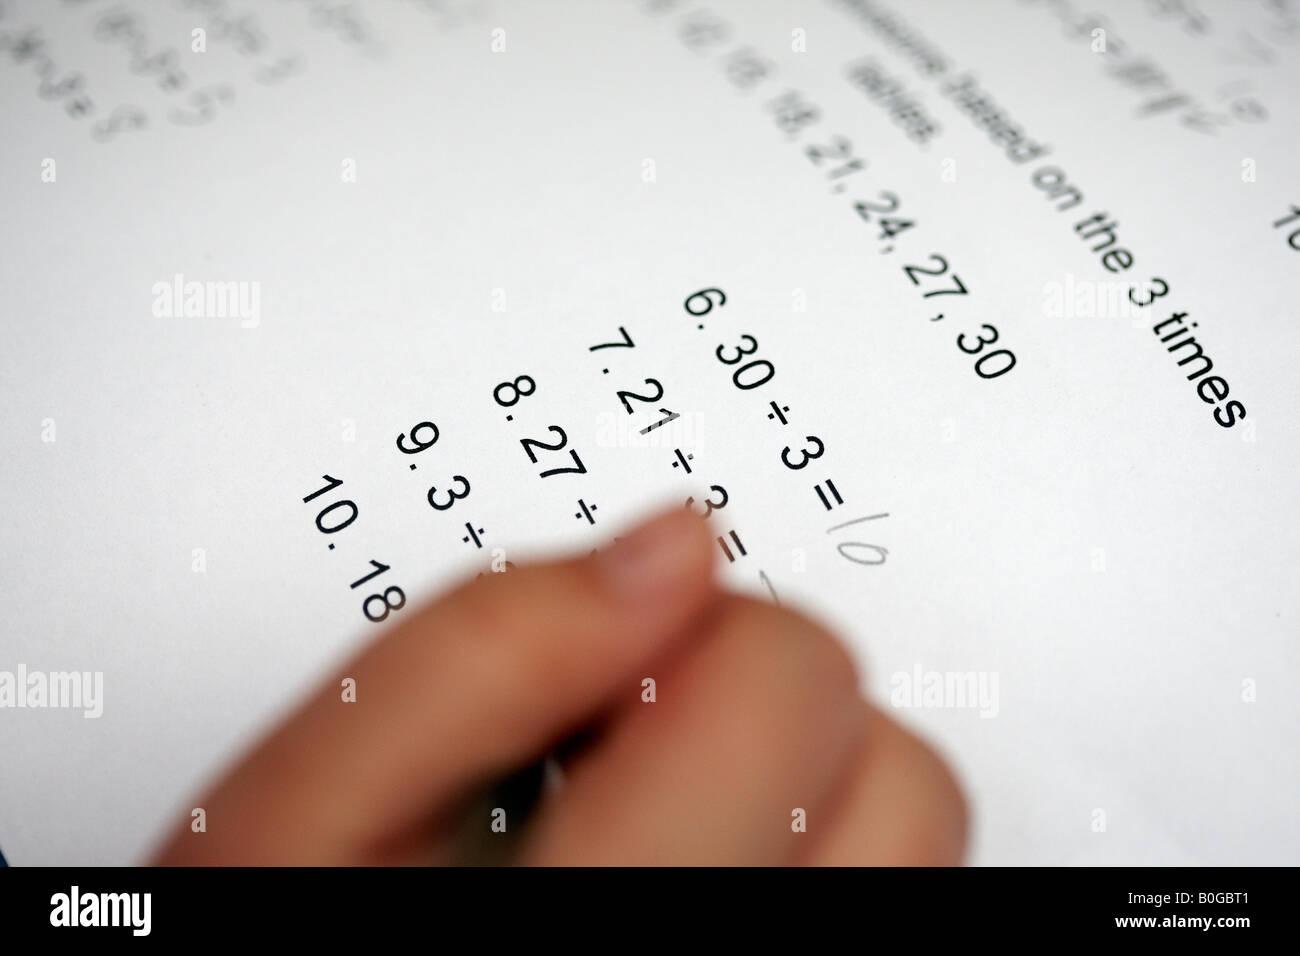 Math Tables Stockfotos & Math Tables Bilder - Alamy